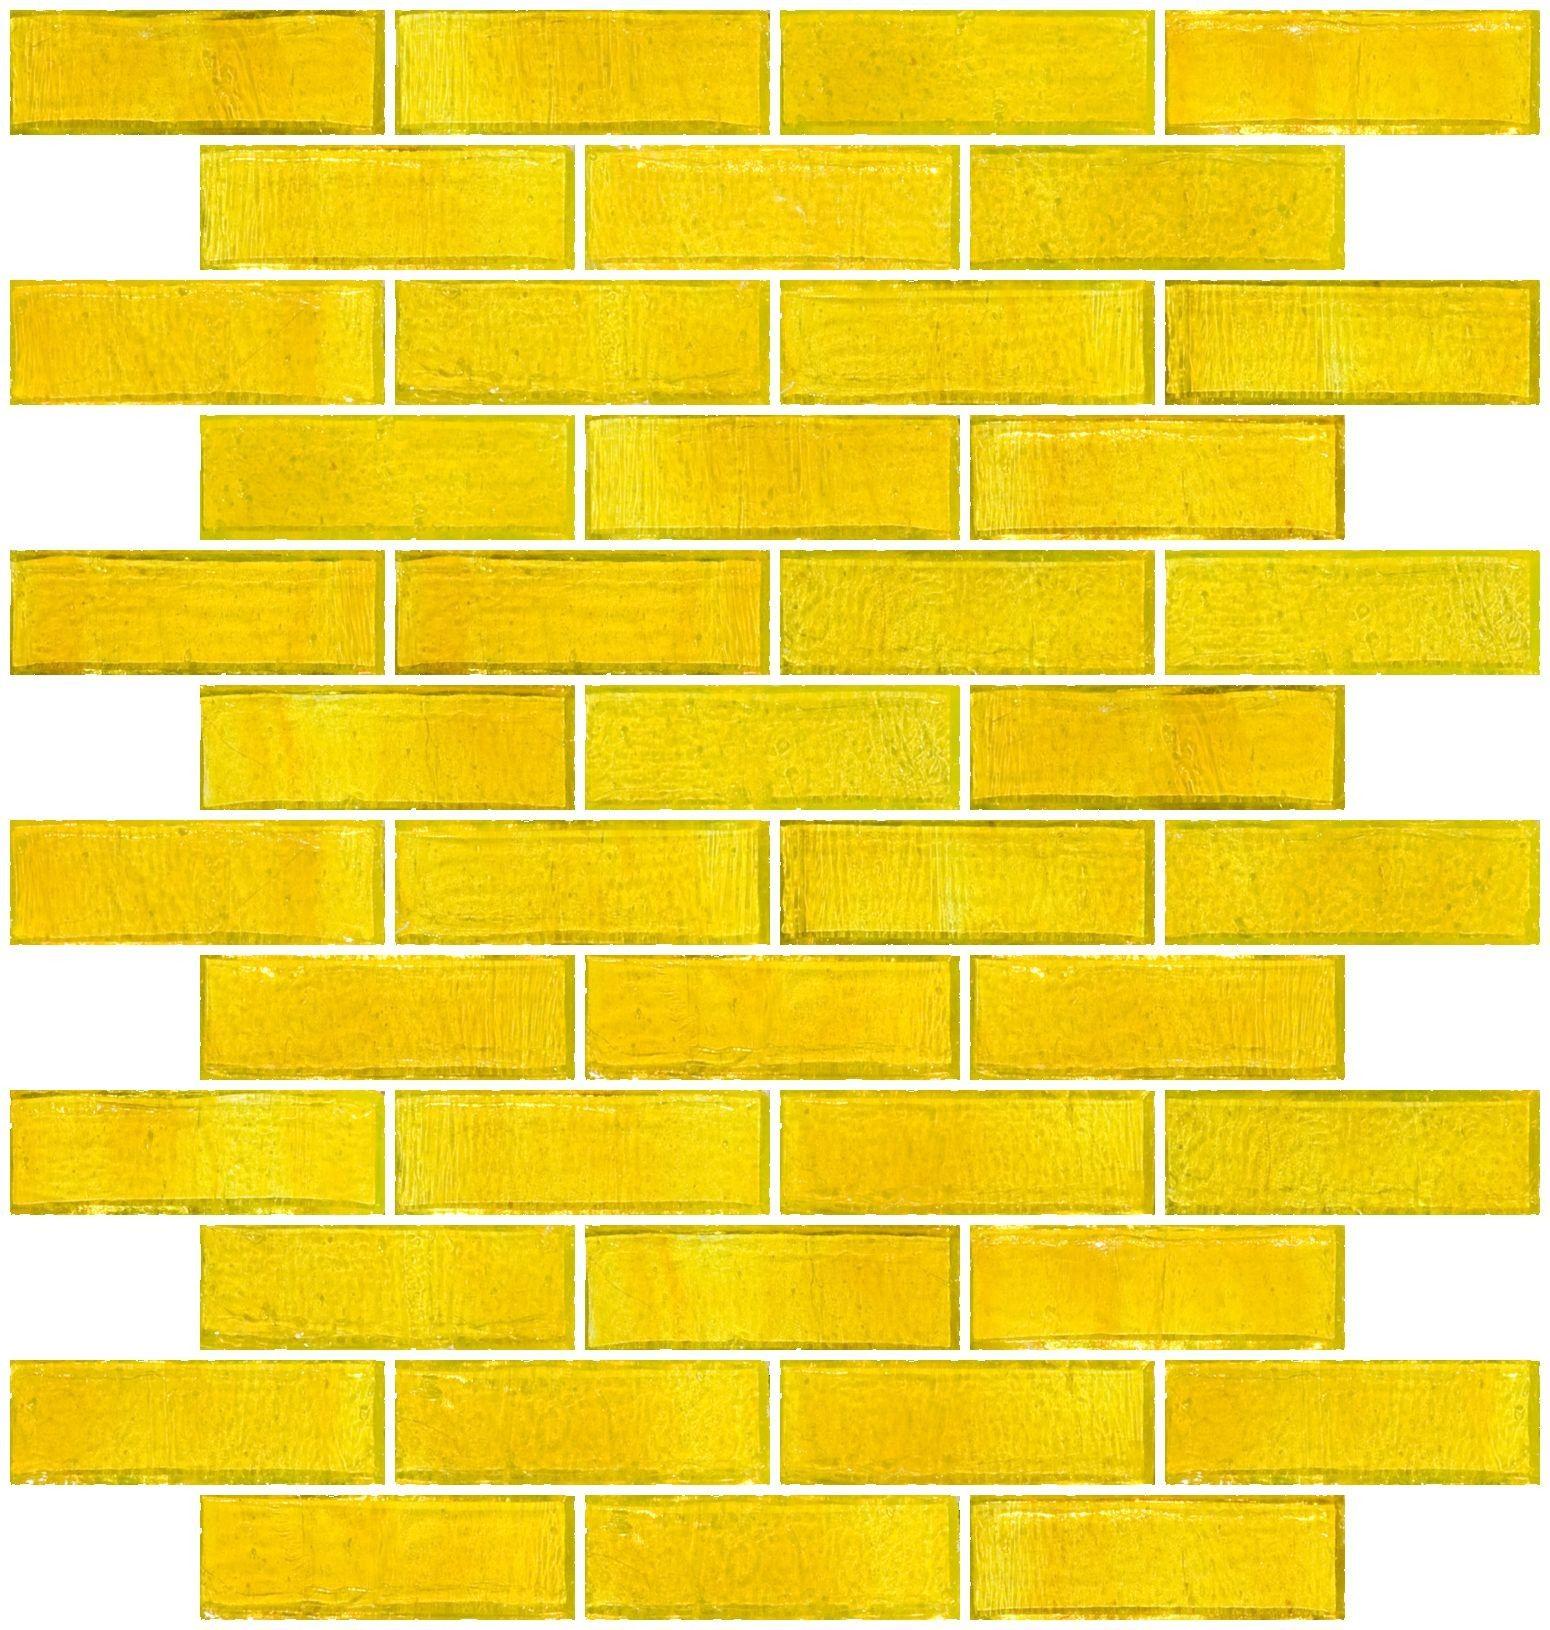 1x3 Inch Sunshine Yellow Transparent Glass Subway Tile